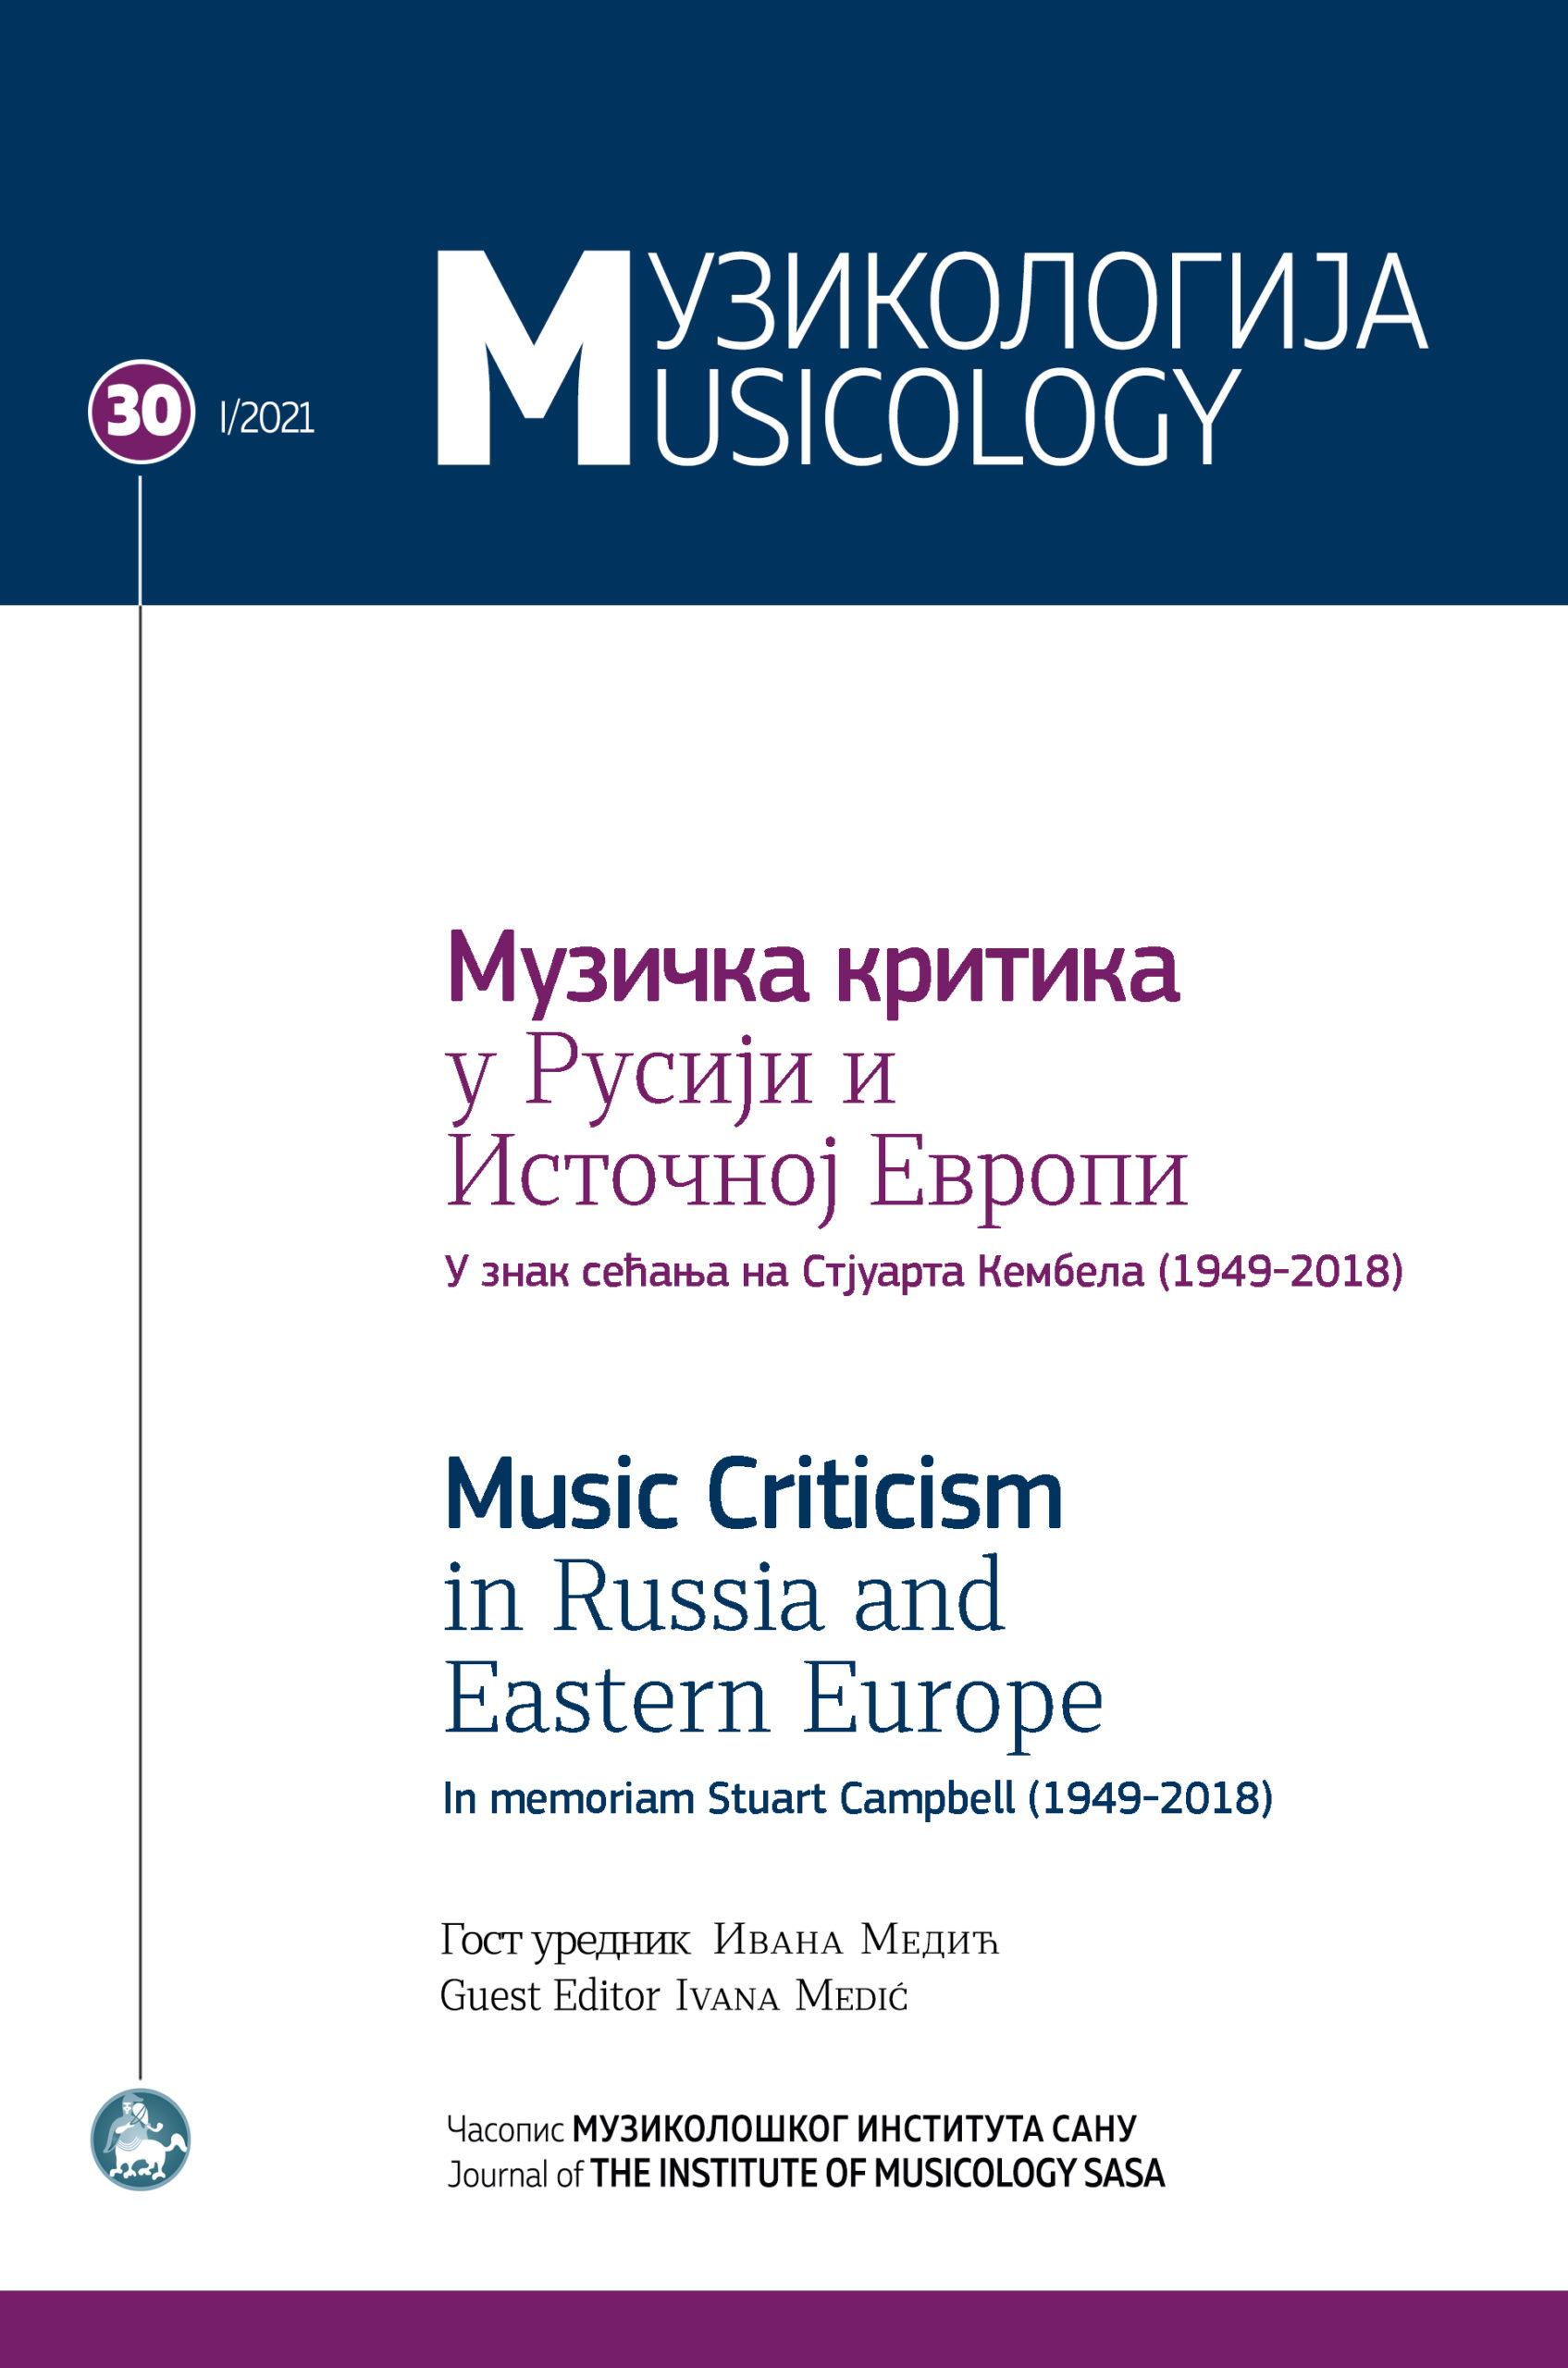 Musicology 30